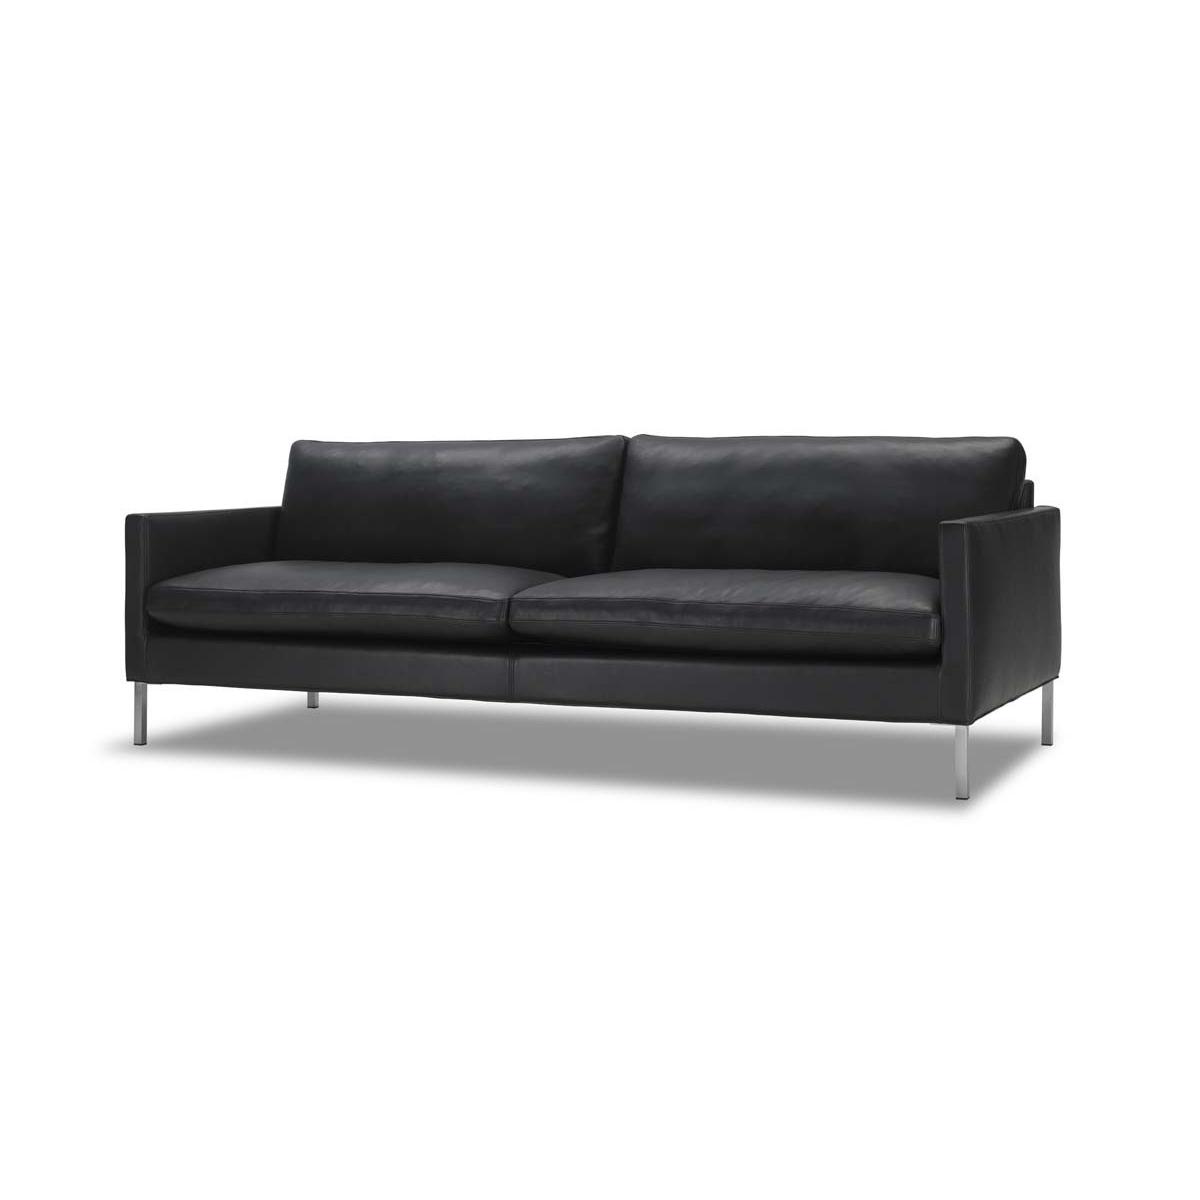 JUUL 903 sofa - Nine zero three | Bolighuset Werenberg